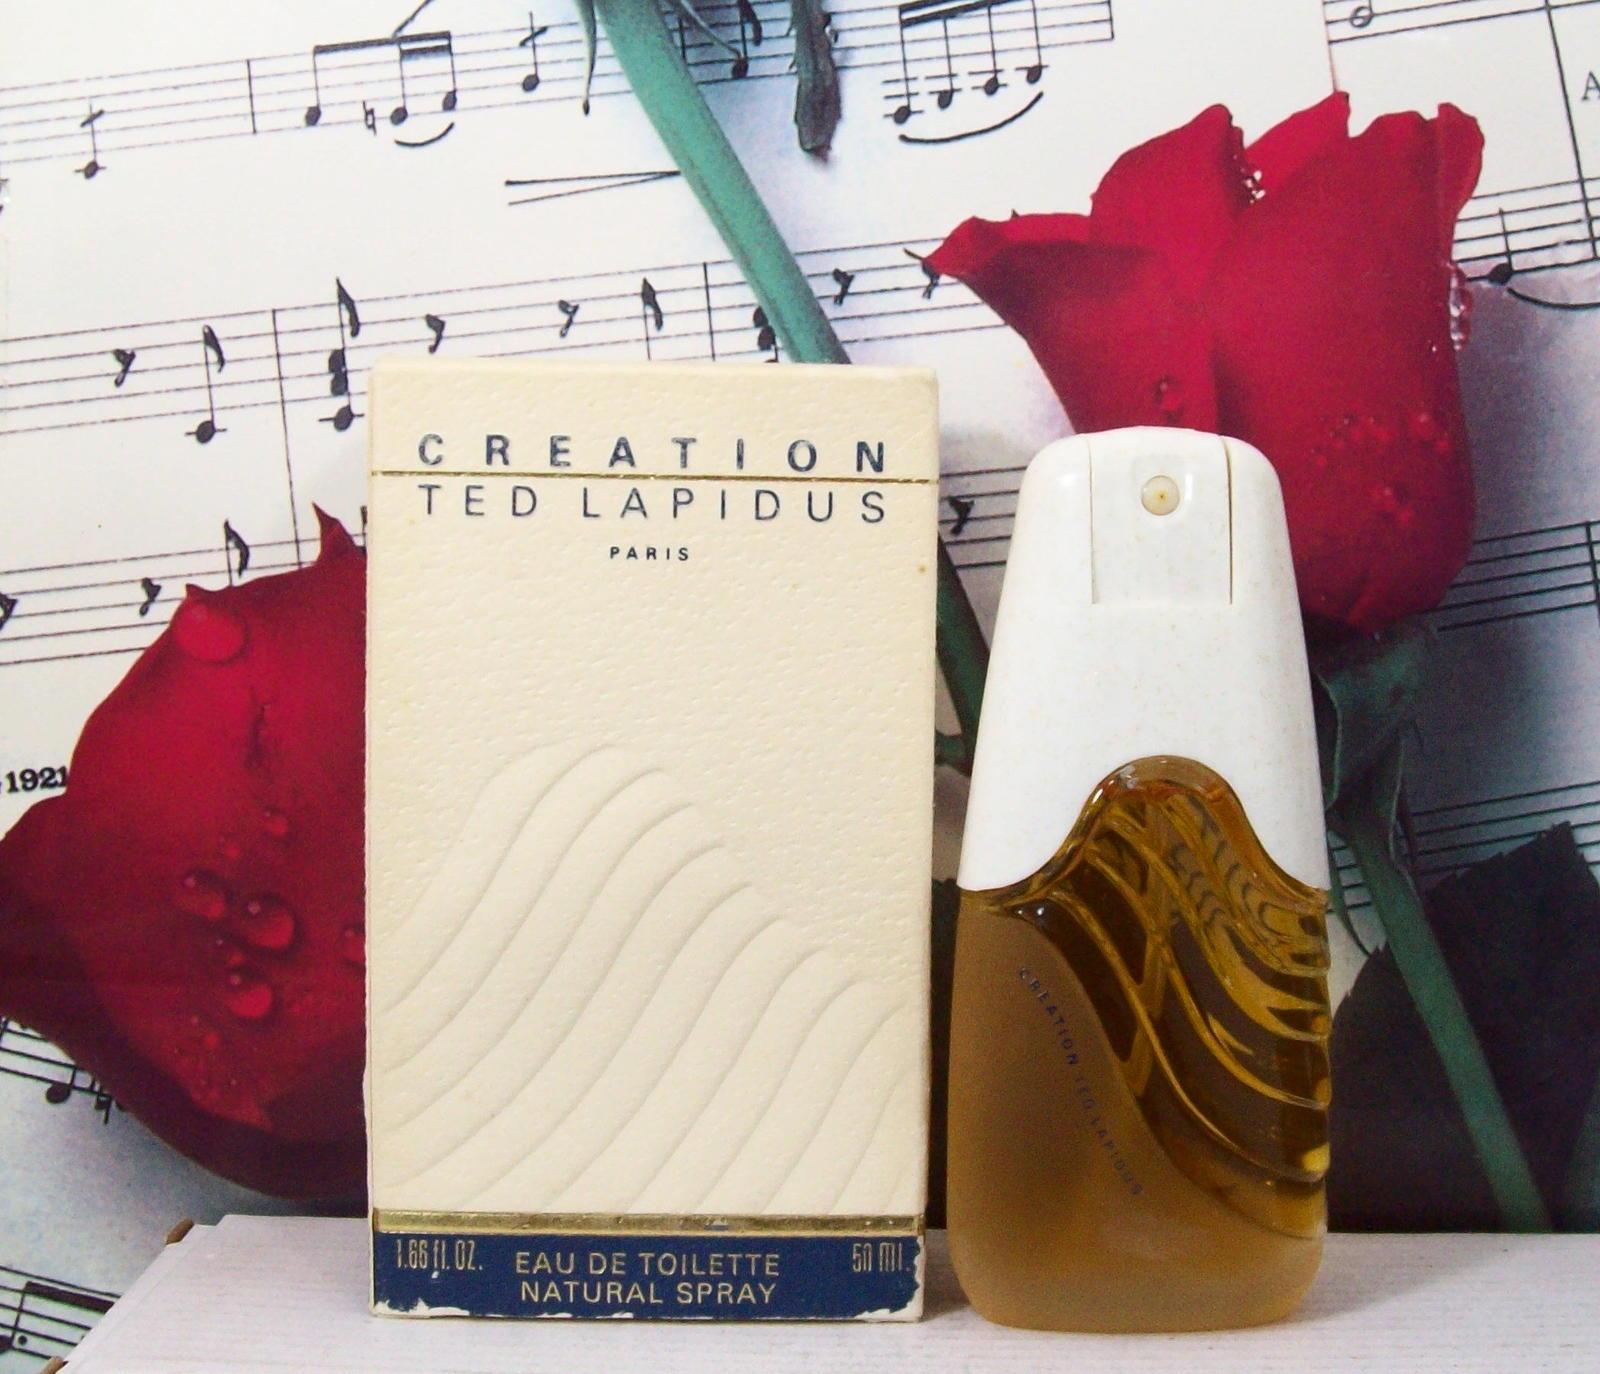 Creation By Ted Lapidus EDT Spray 1.66 FL. OZ. NWB. Vintage - $29.99